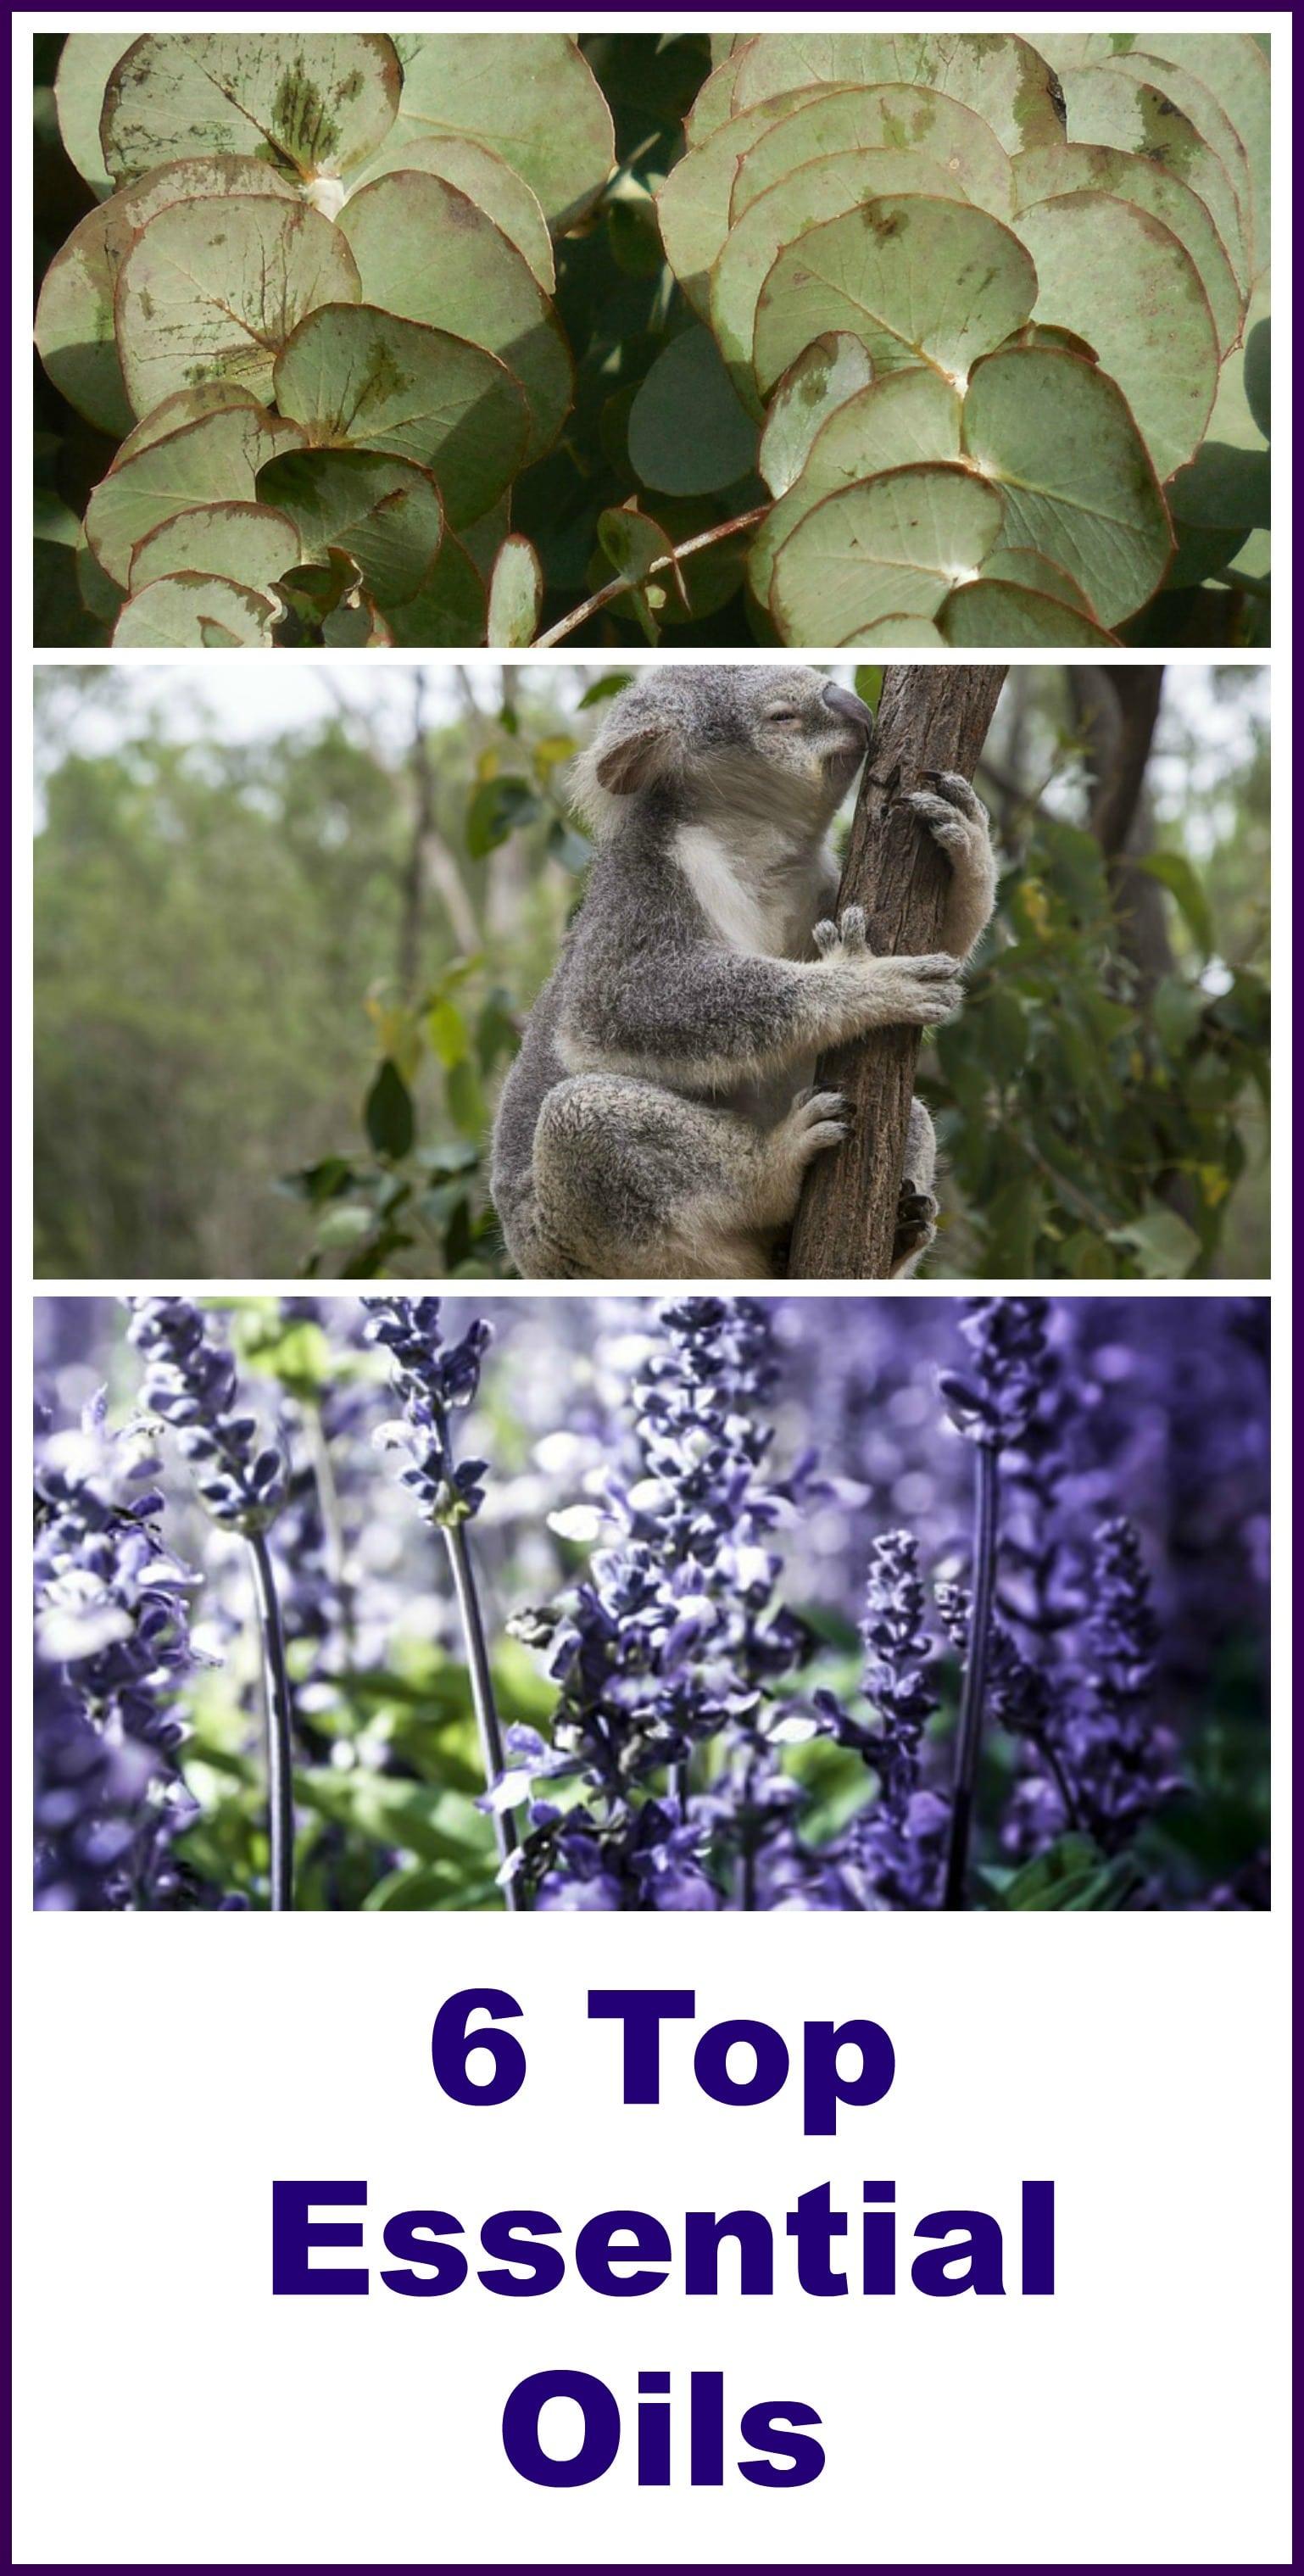 Edens Garden Essential Oils Sets - Organic Palace Queen